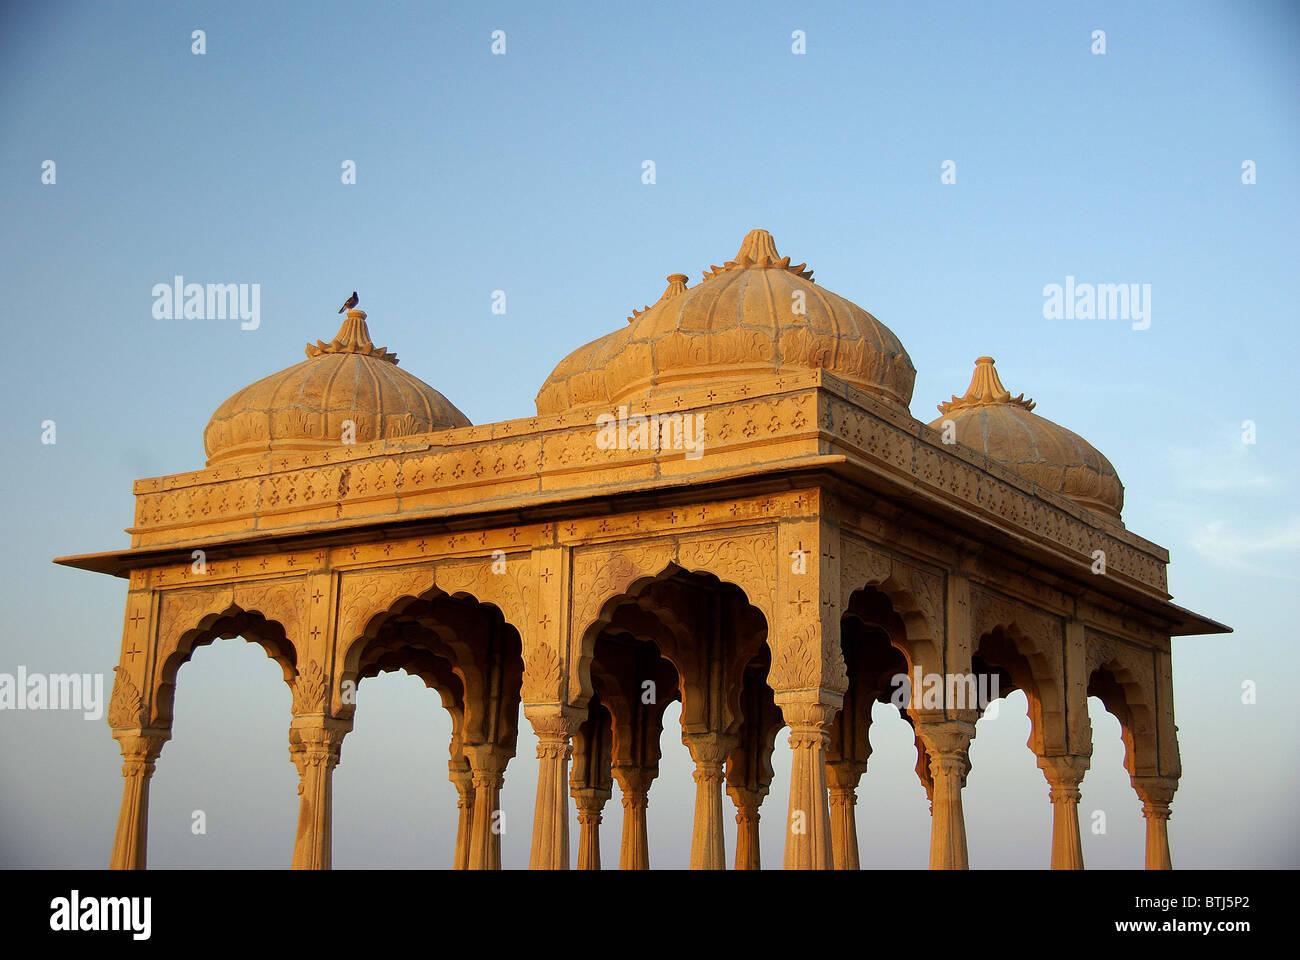 Rajput tomba nel Rajasthan, India Immagini Stock